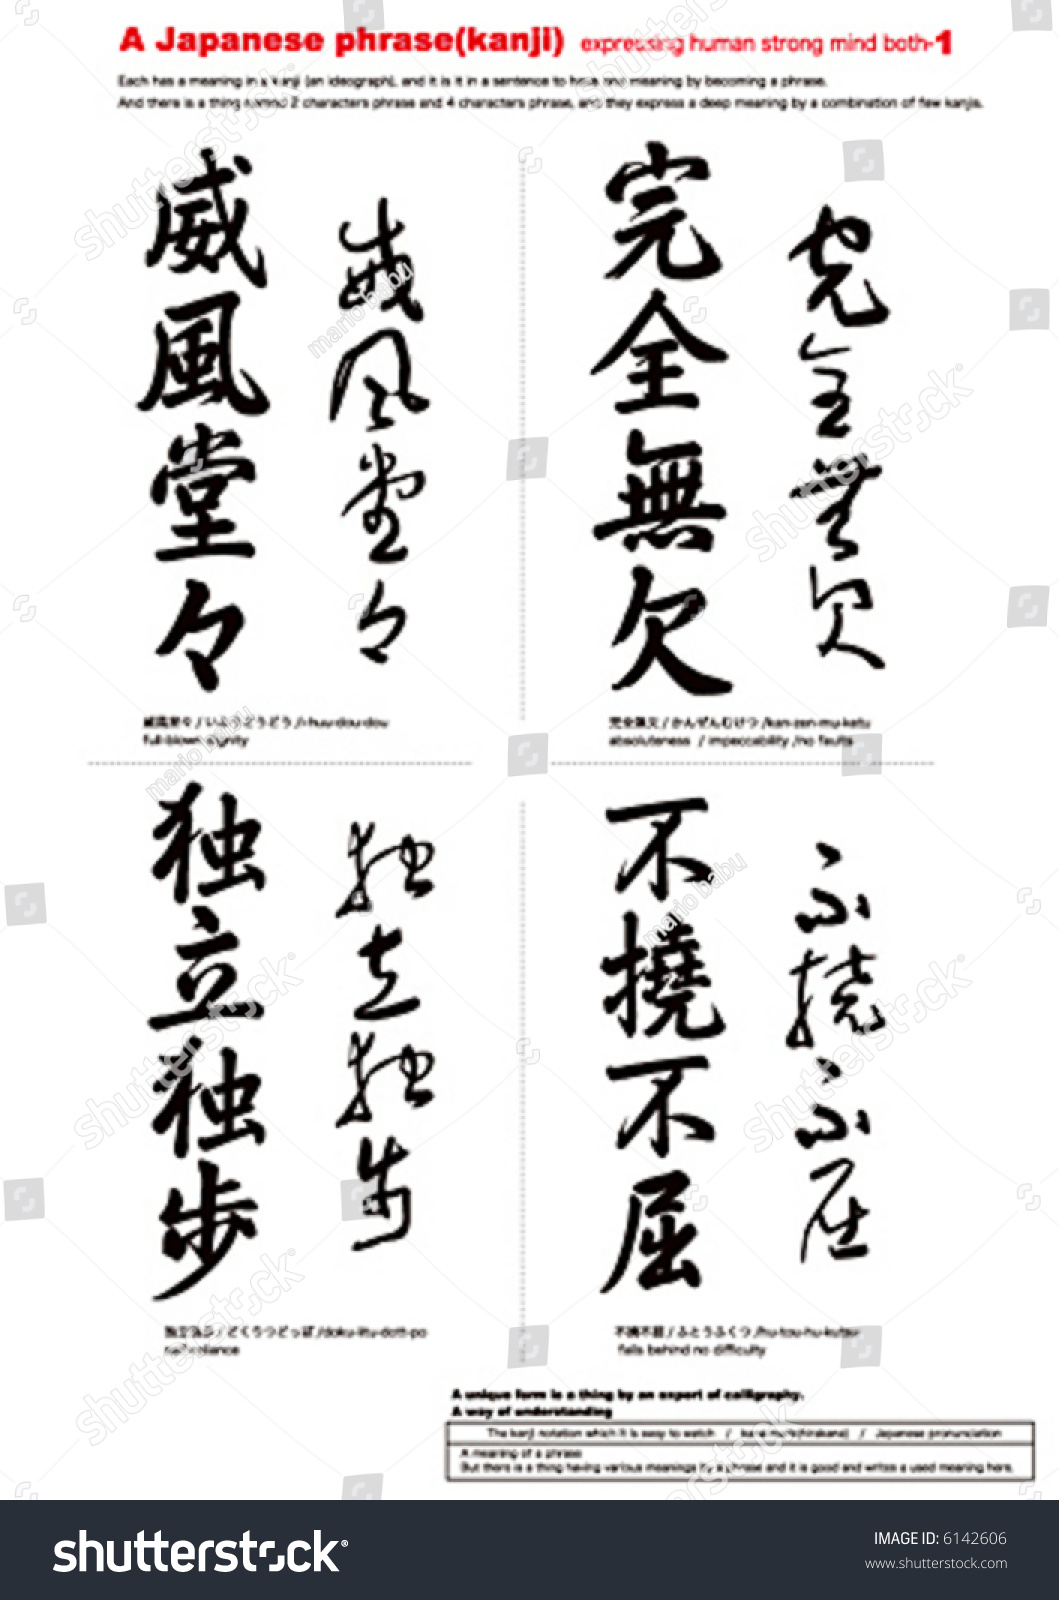 Japanese Calligraphy Explanationkanji Characters Expressing Human